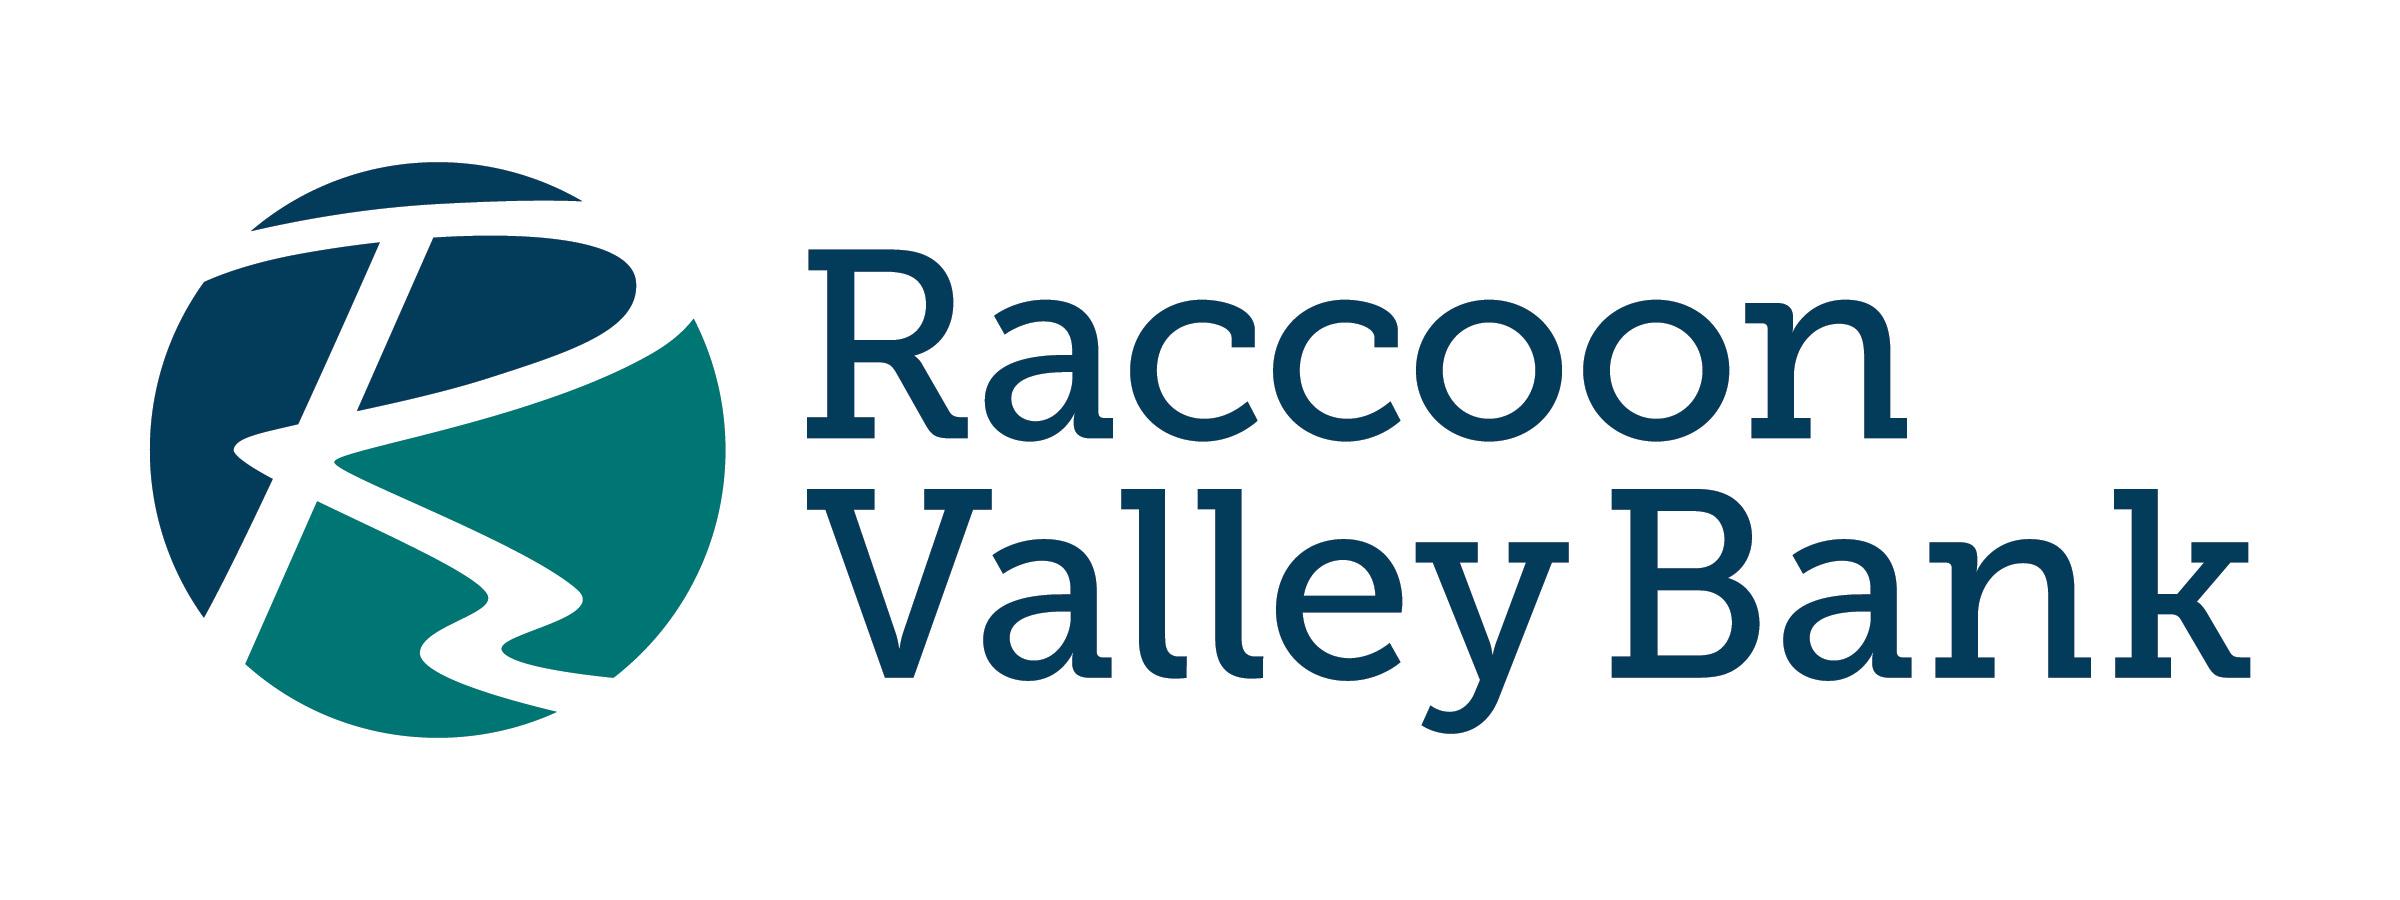 Raccoon Valley Bank New 2018